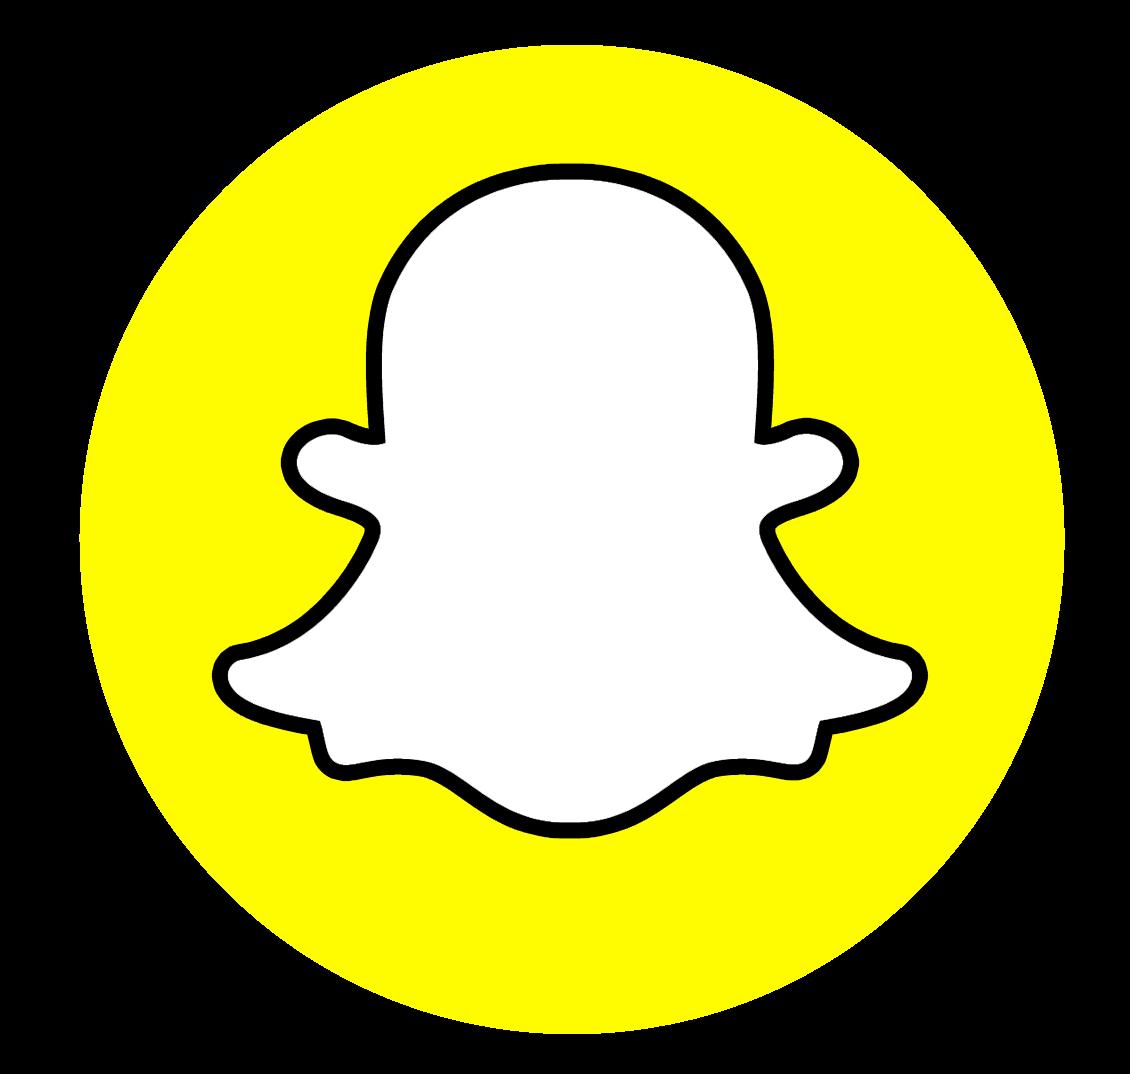 Estou no Snapchat, siga-me lá